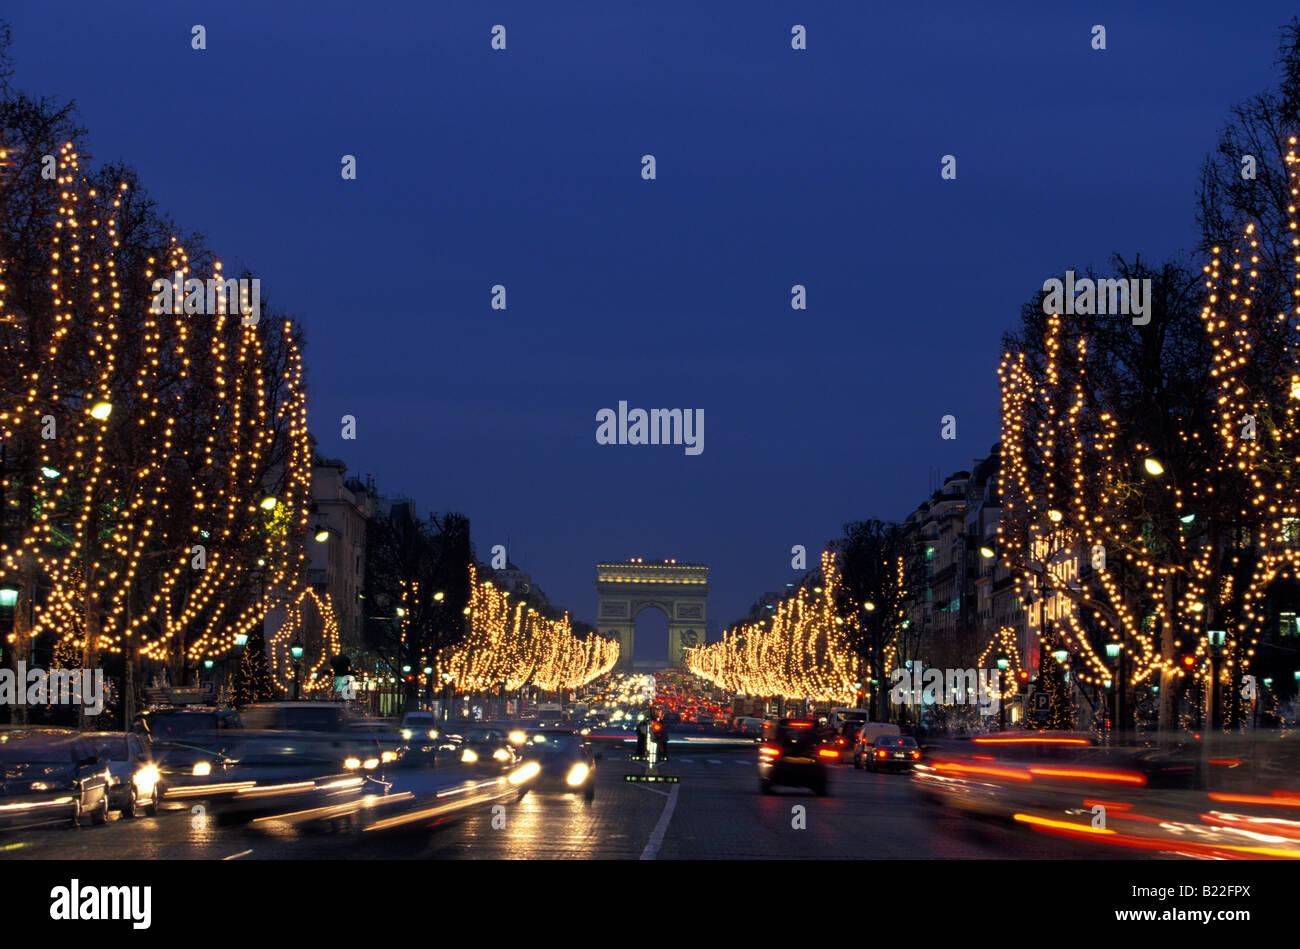 Christmas Lights In Paris.Christmas Lights Arc De Triomphe And Champs Elysees Paris